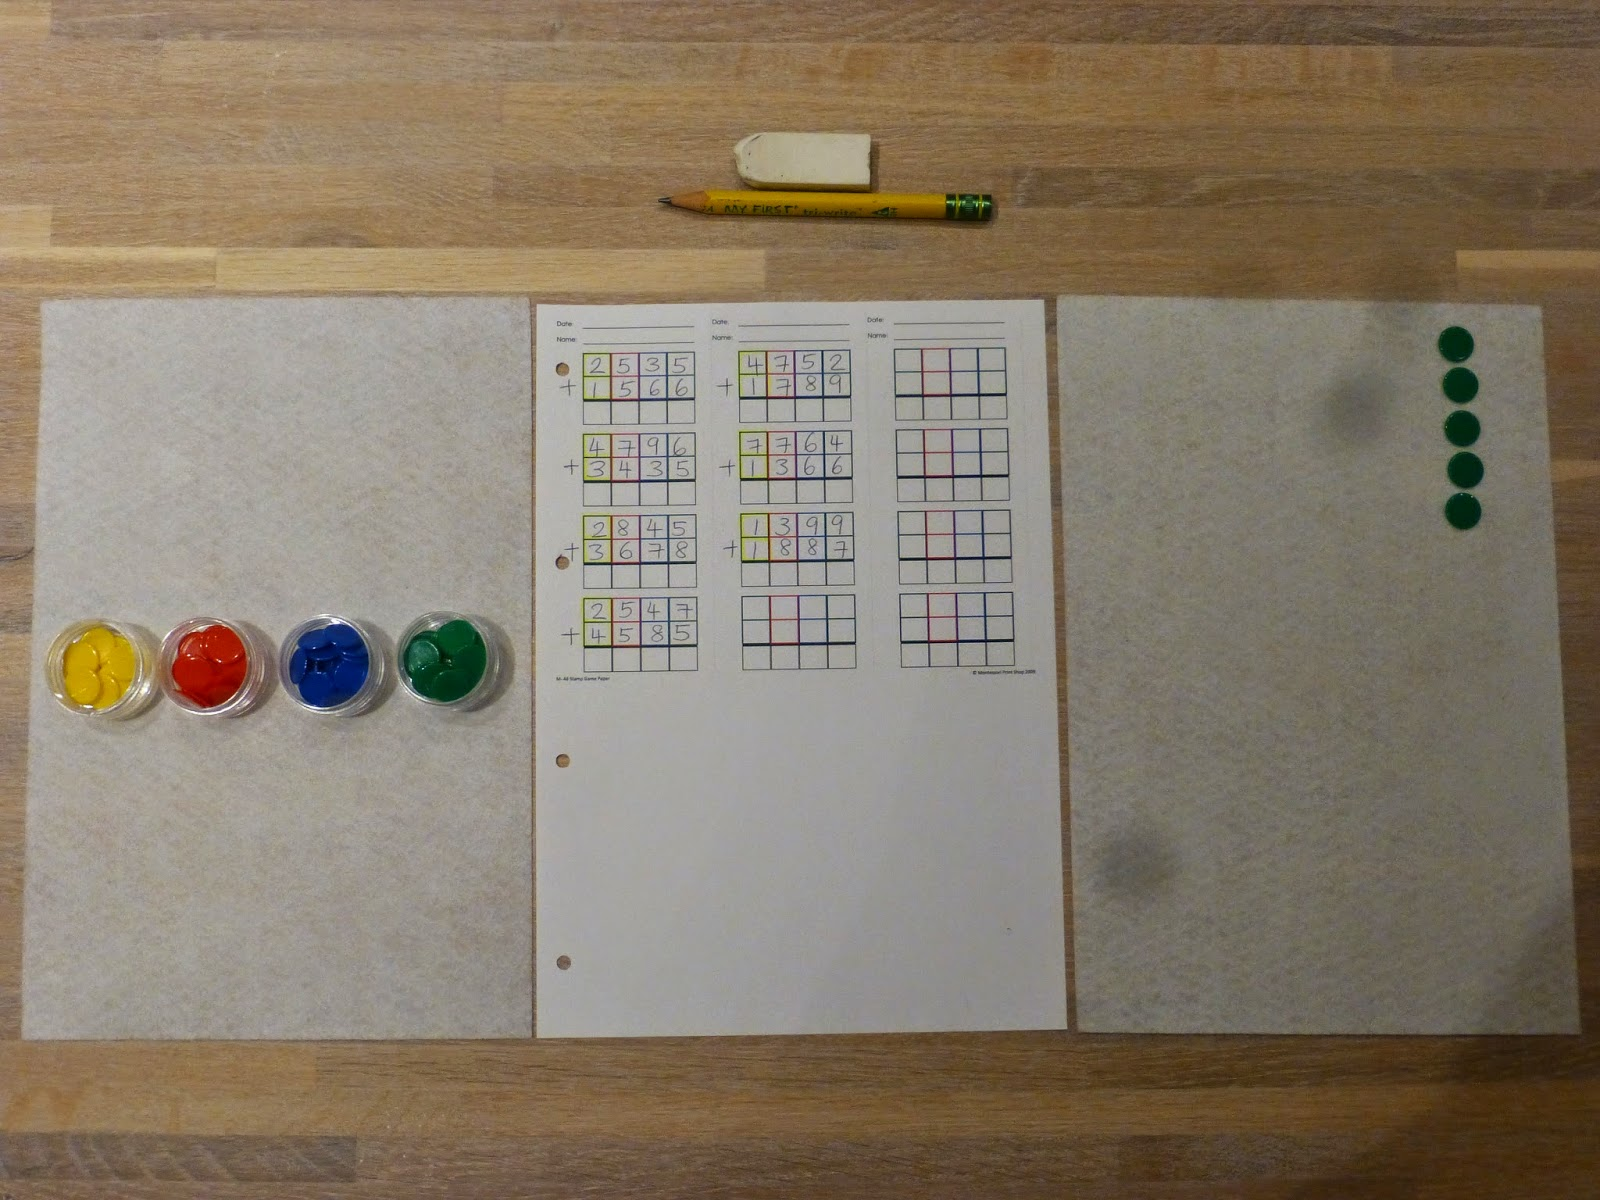 math worksheet : montessori dynamic addition worksheets  making montessori ours  : Dynamic Math Worksheets